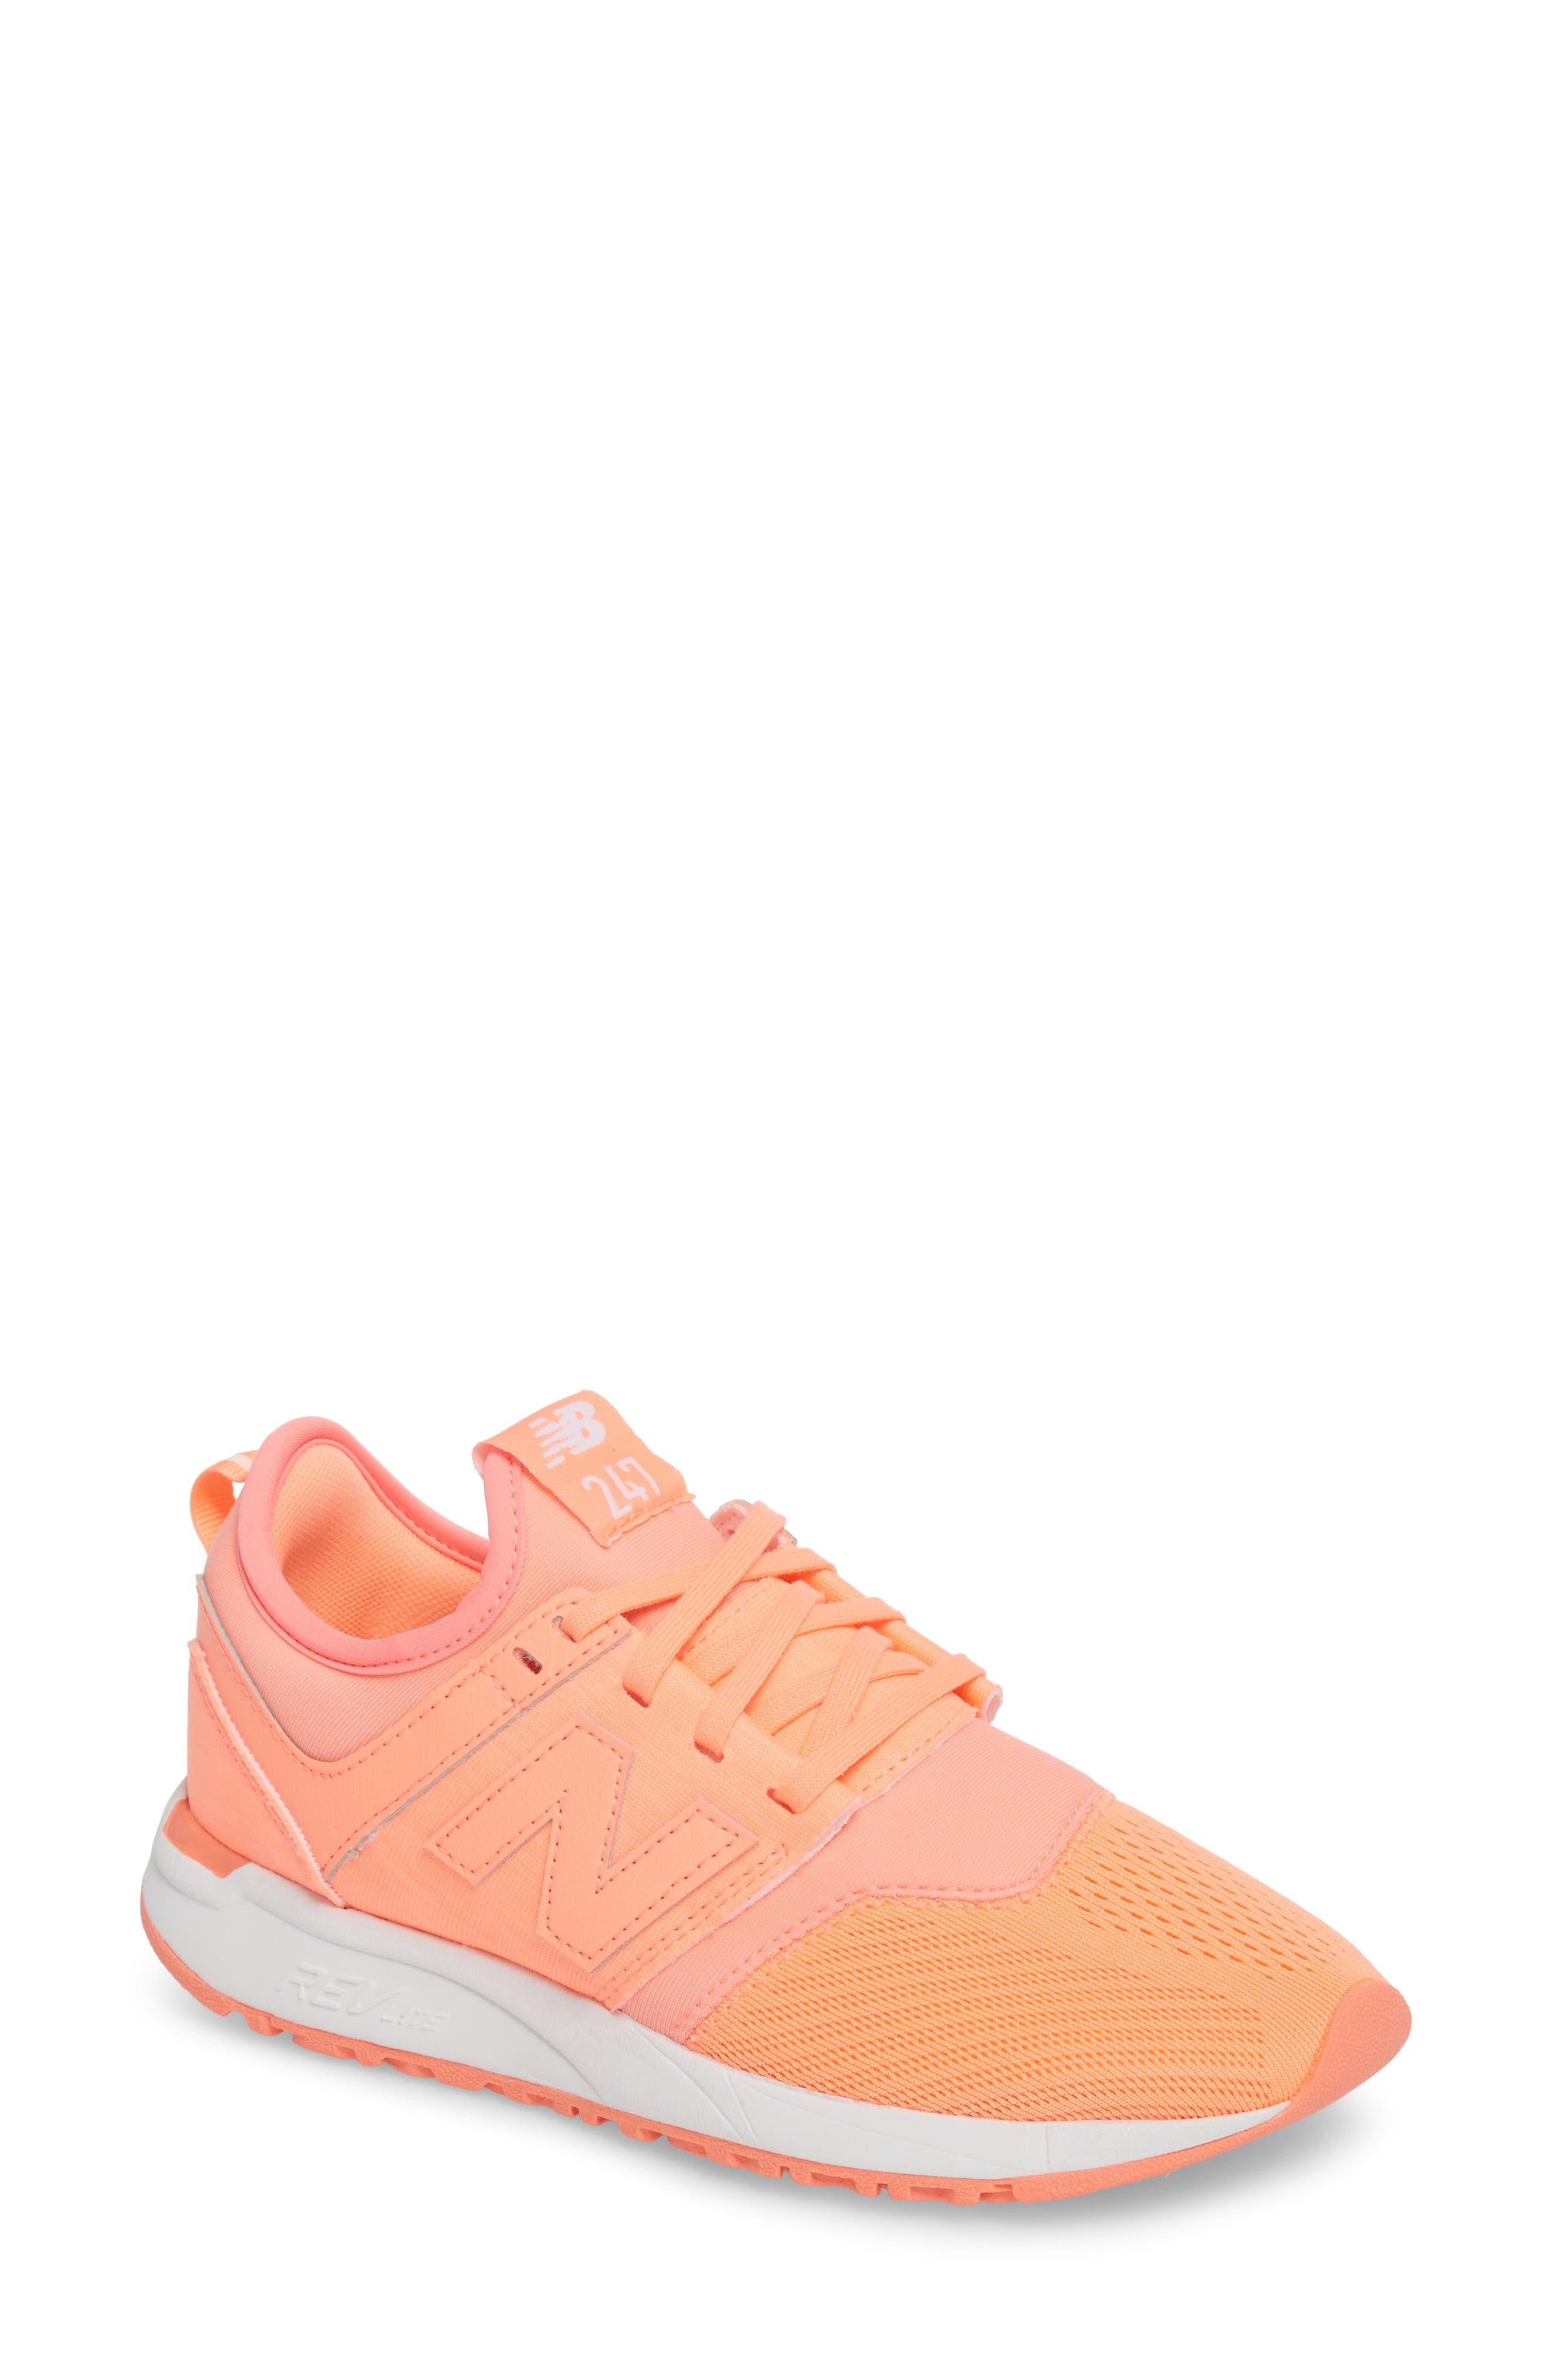 247 Classic Sneaker,                             Main thumbnail 2, color,